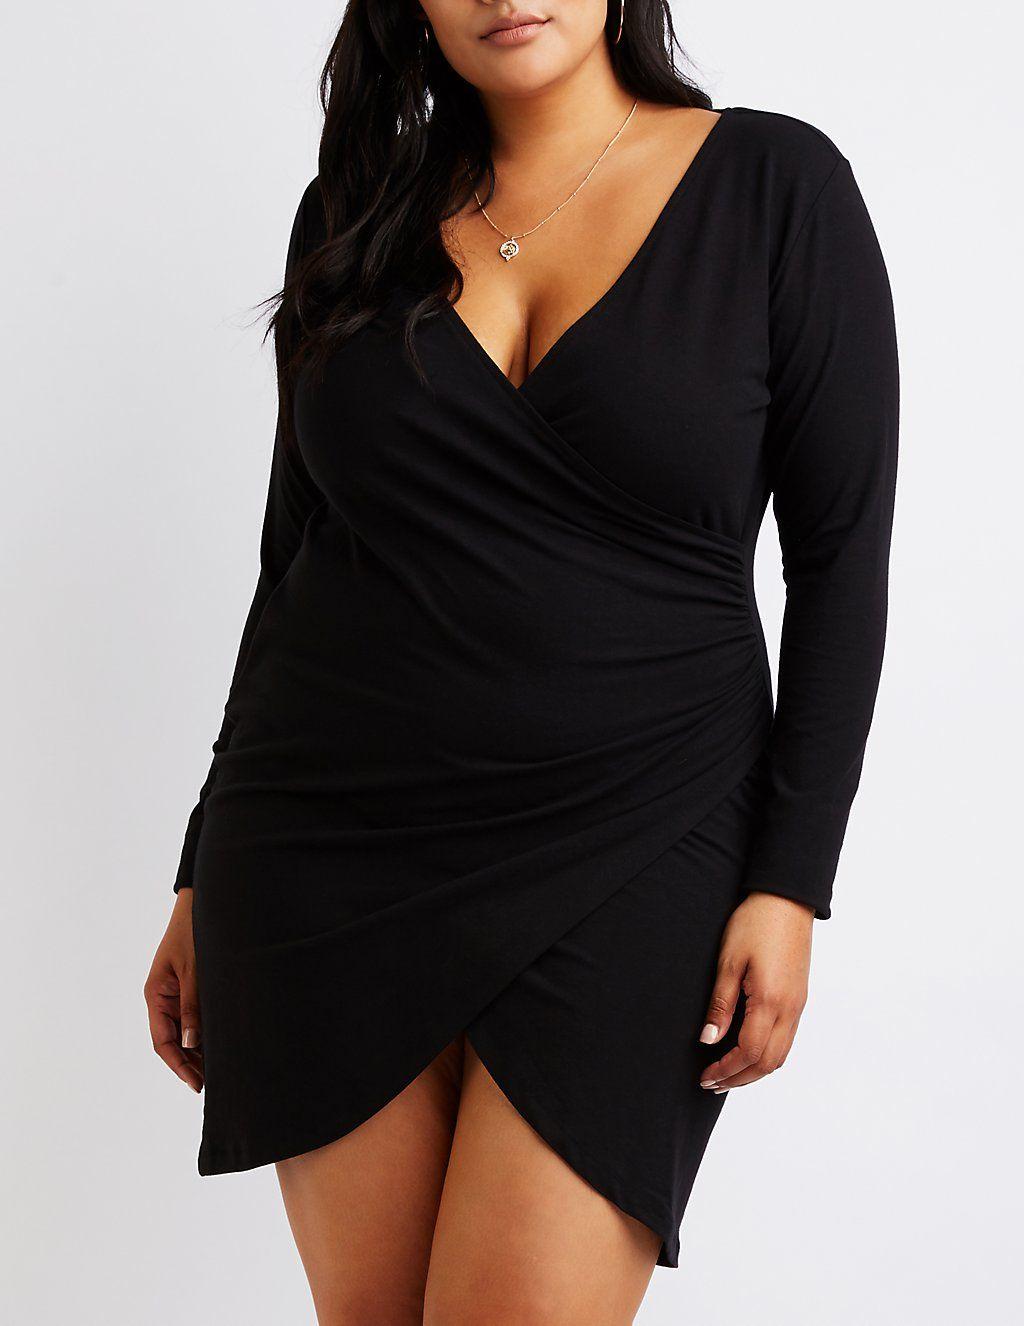 78e8dc31ceac1 Plus Size Wrap Bodycon Dress